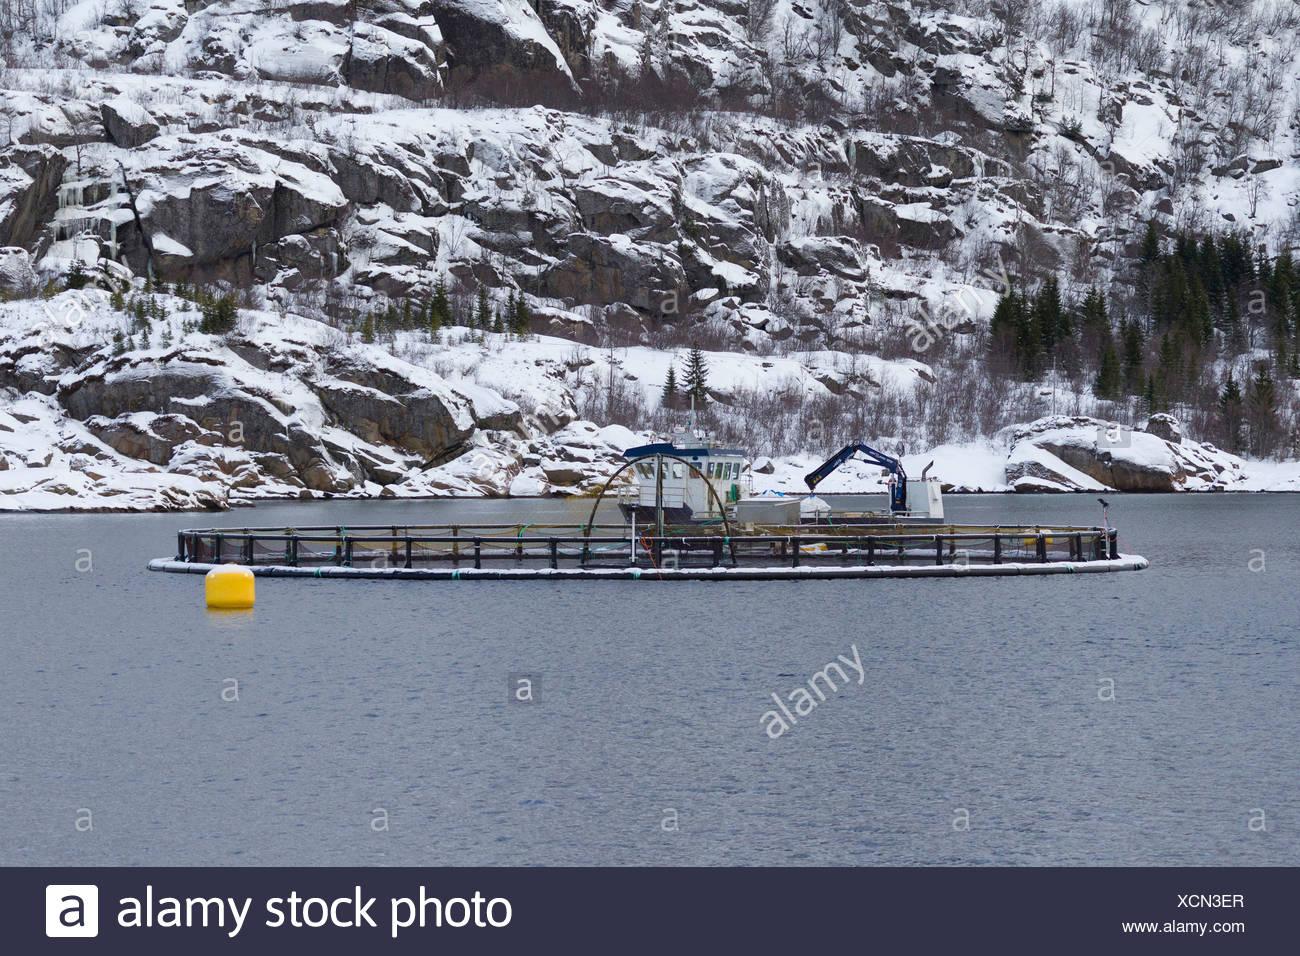 Salmon farm with characteristic cage in a Norwegian fjord.  Raftsund, Lofoten, Norwegen - Stock Image